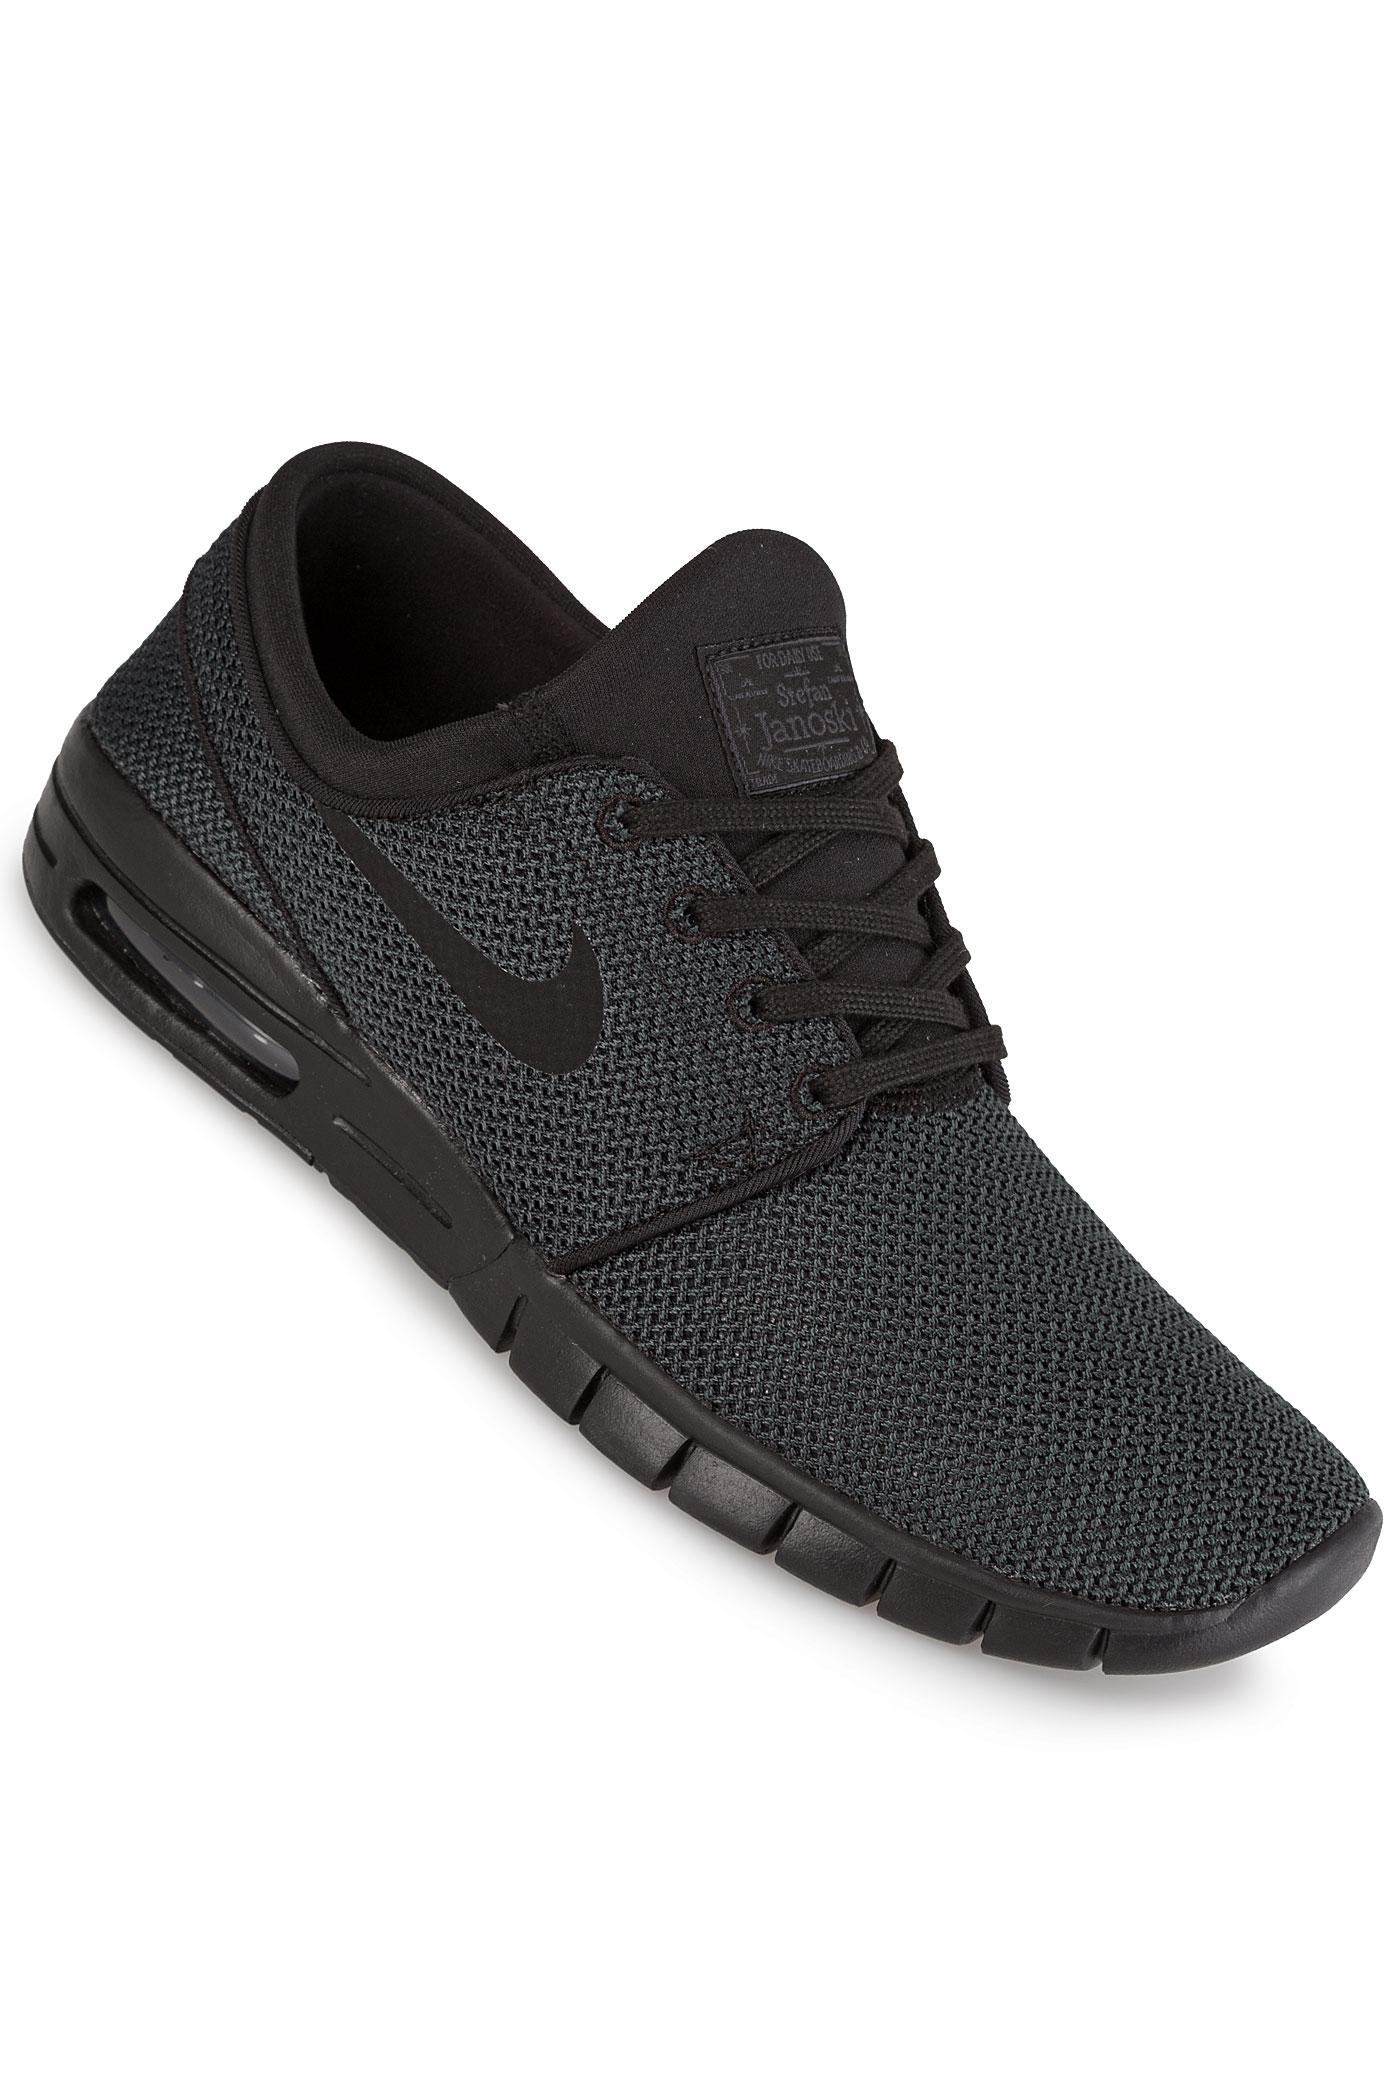 nike sb zoom stefan janoski max chaussure black black achetez sur skatedeluxe. Black Bedroom Furniture Sets. Home Design Ideas